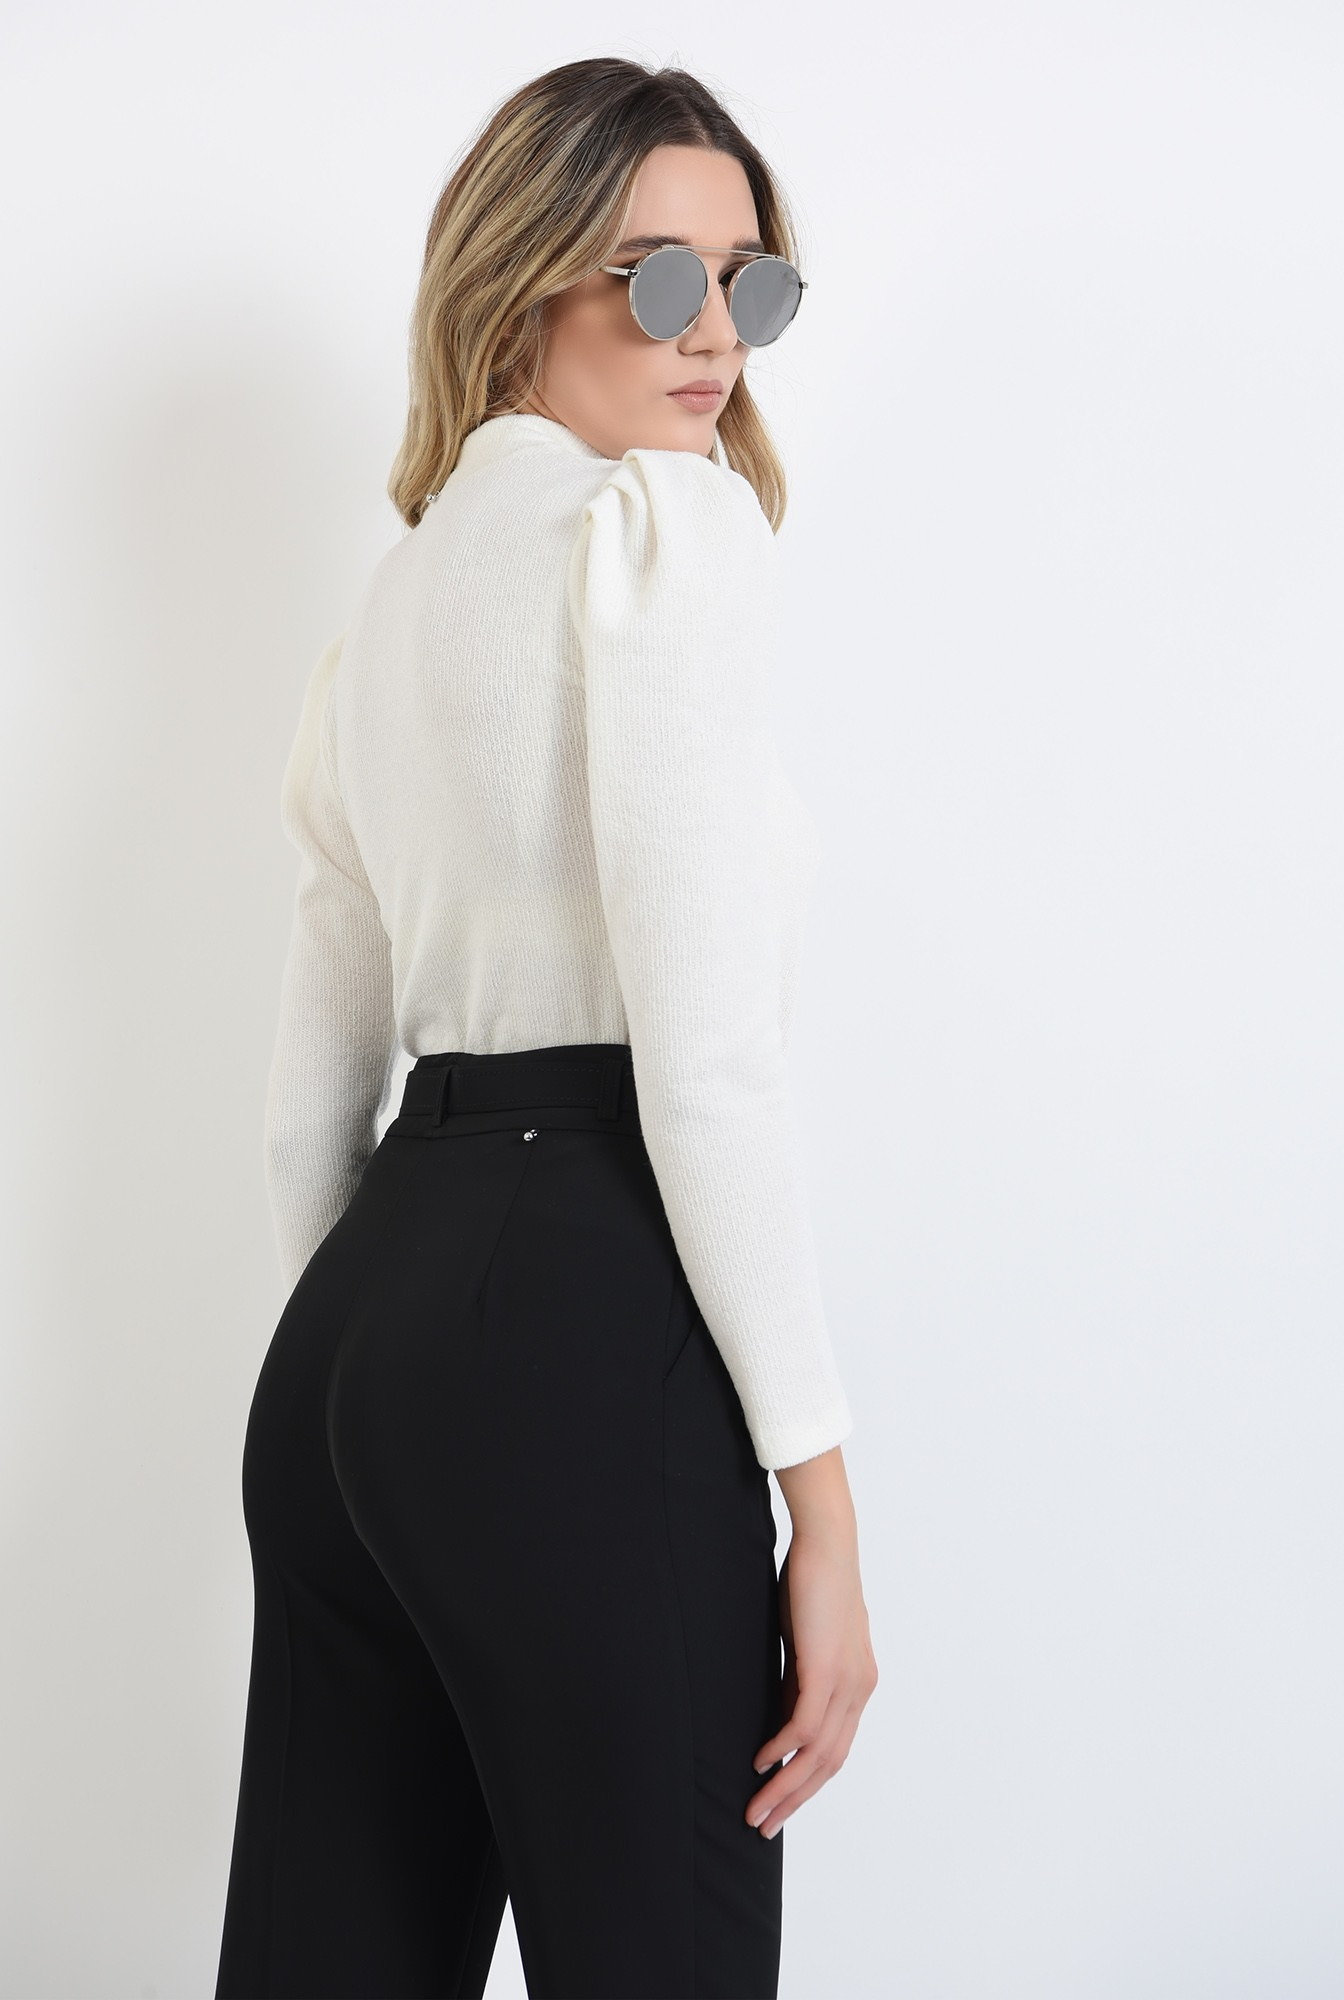 1 - pulover cu umeri accentuati, tricotat, alb, cu maneca lunga